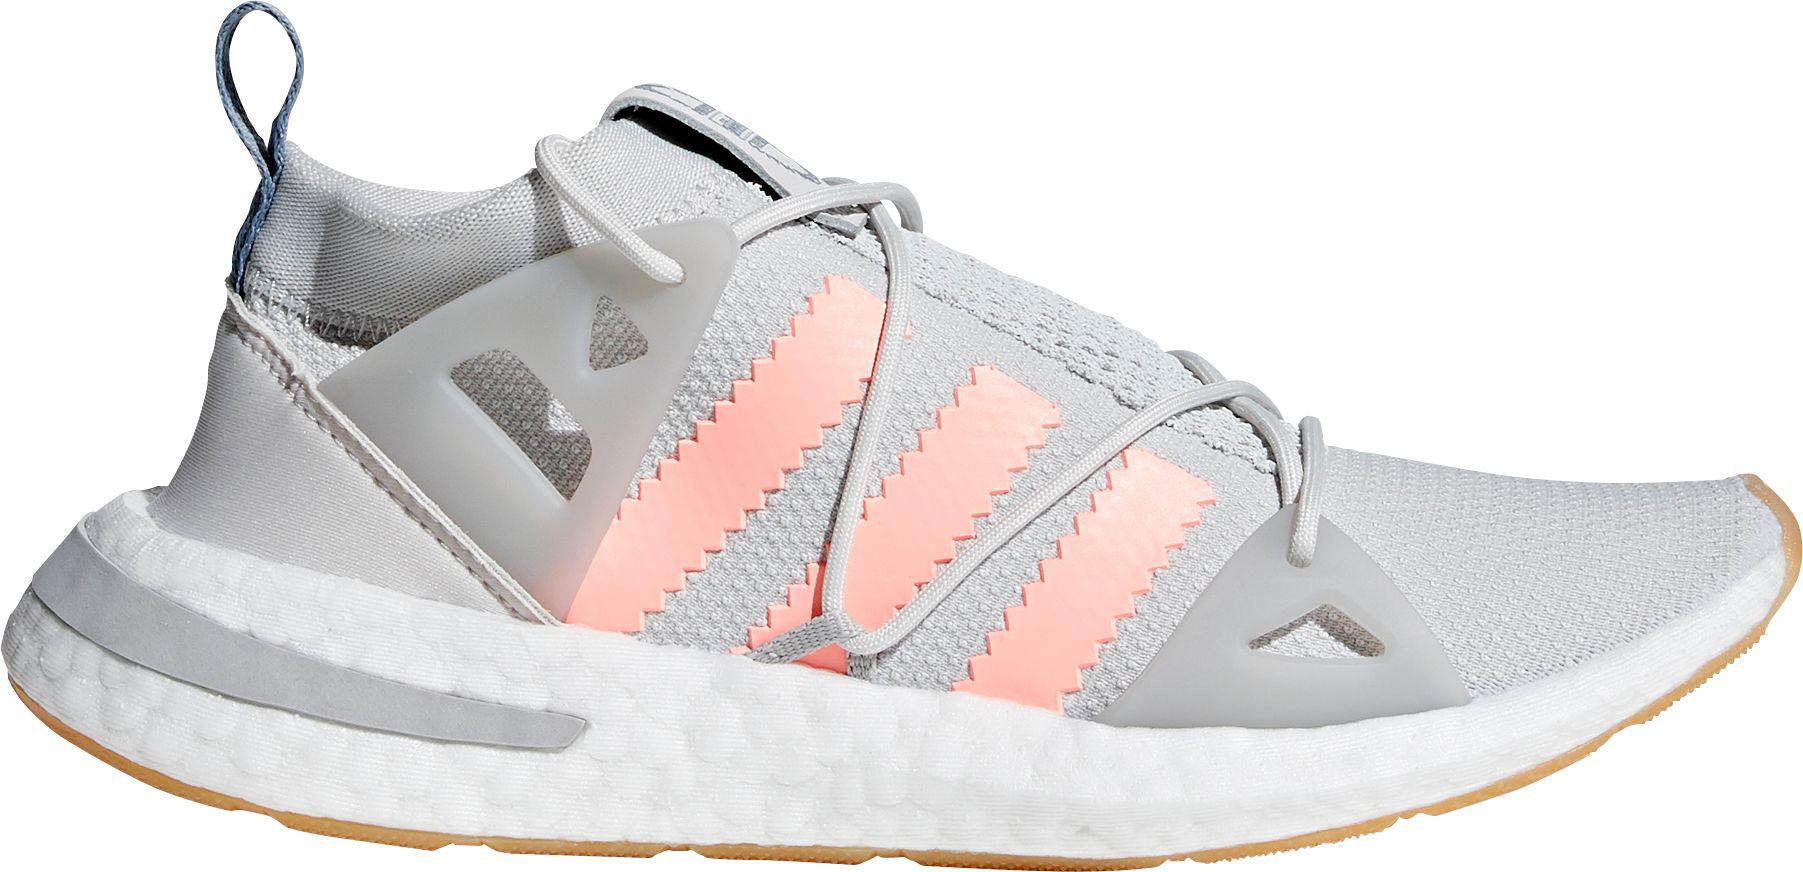 damen adidas Originals SWIFT RUN Sneaker low greyorange